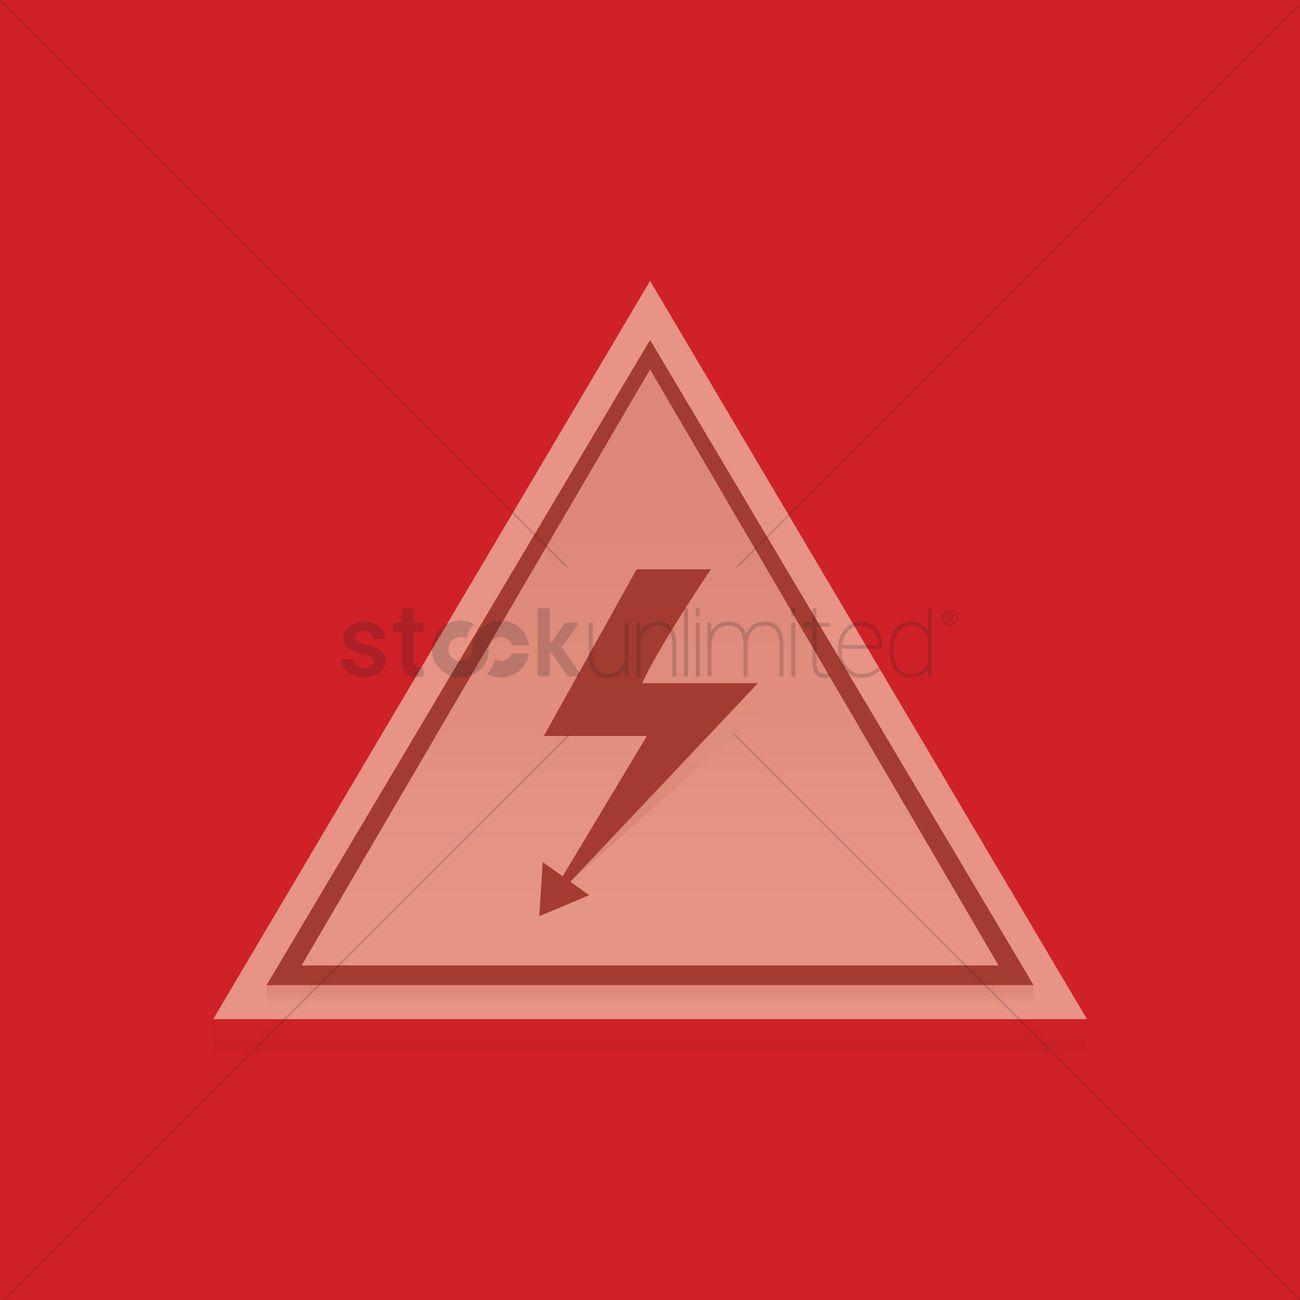 High Voltage Symbol Vector Image 1347658 Stockunlimited